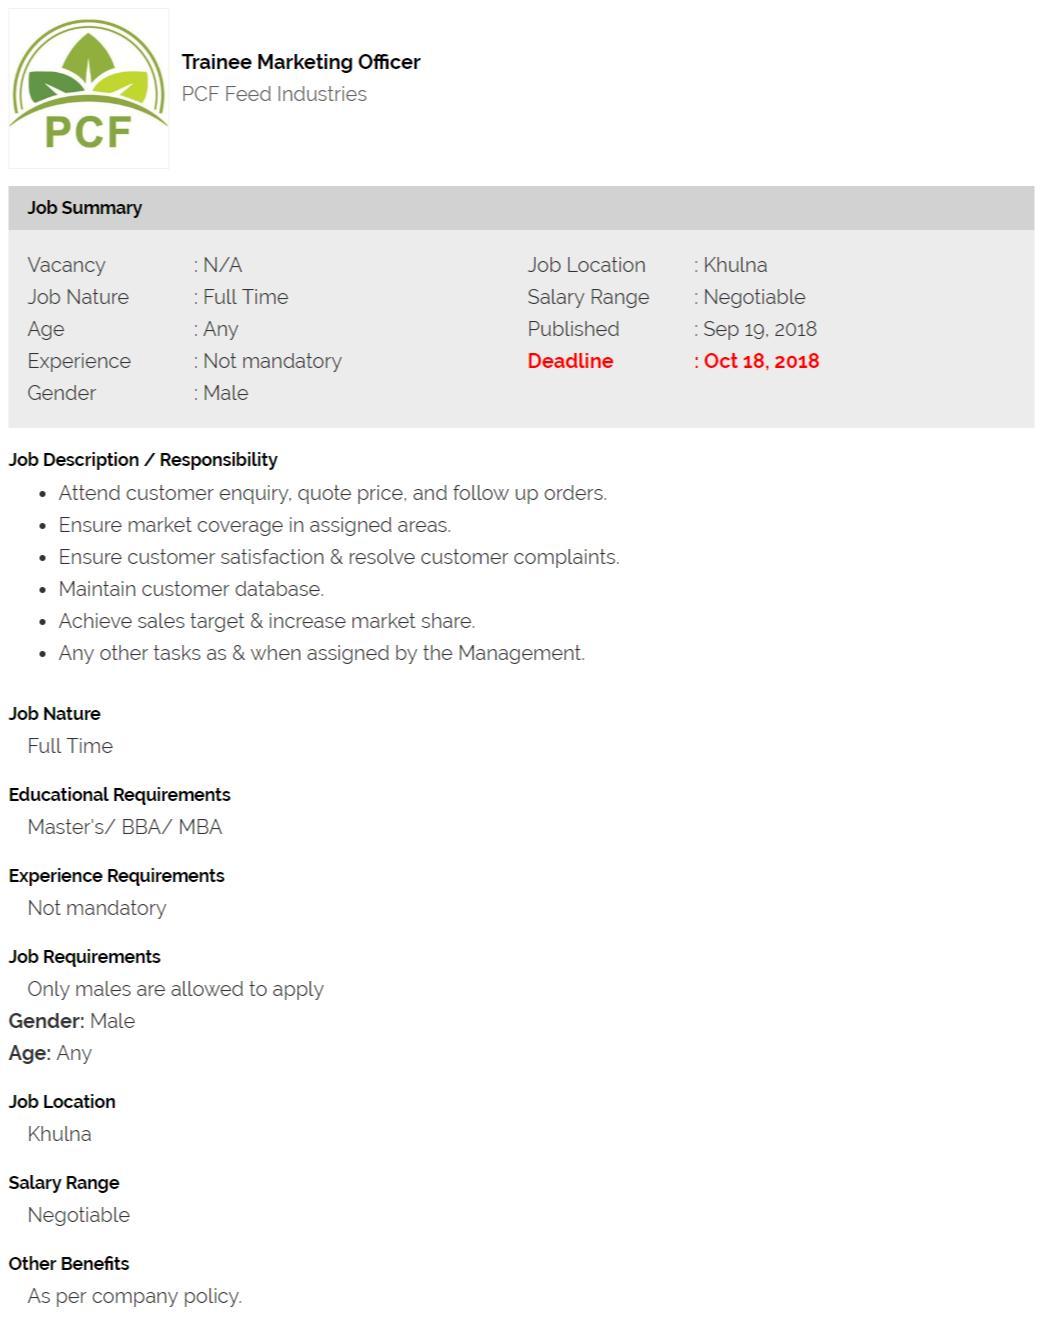 PCF Feed Industries Job Circular